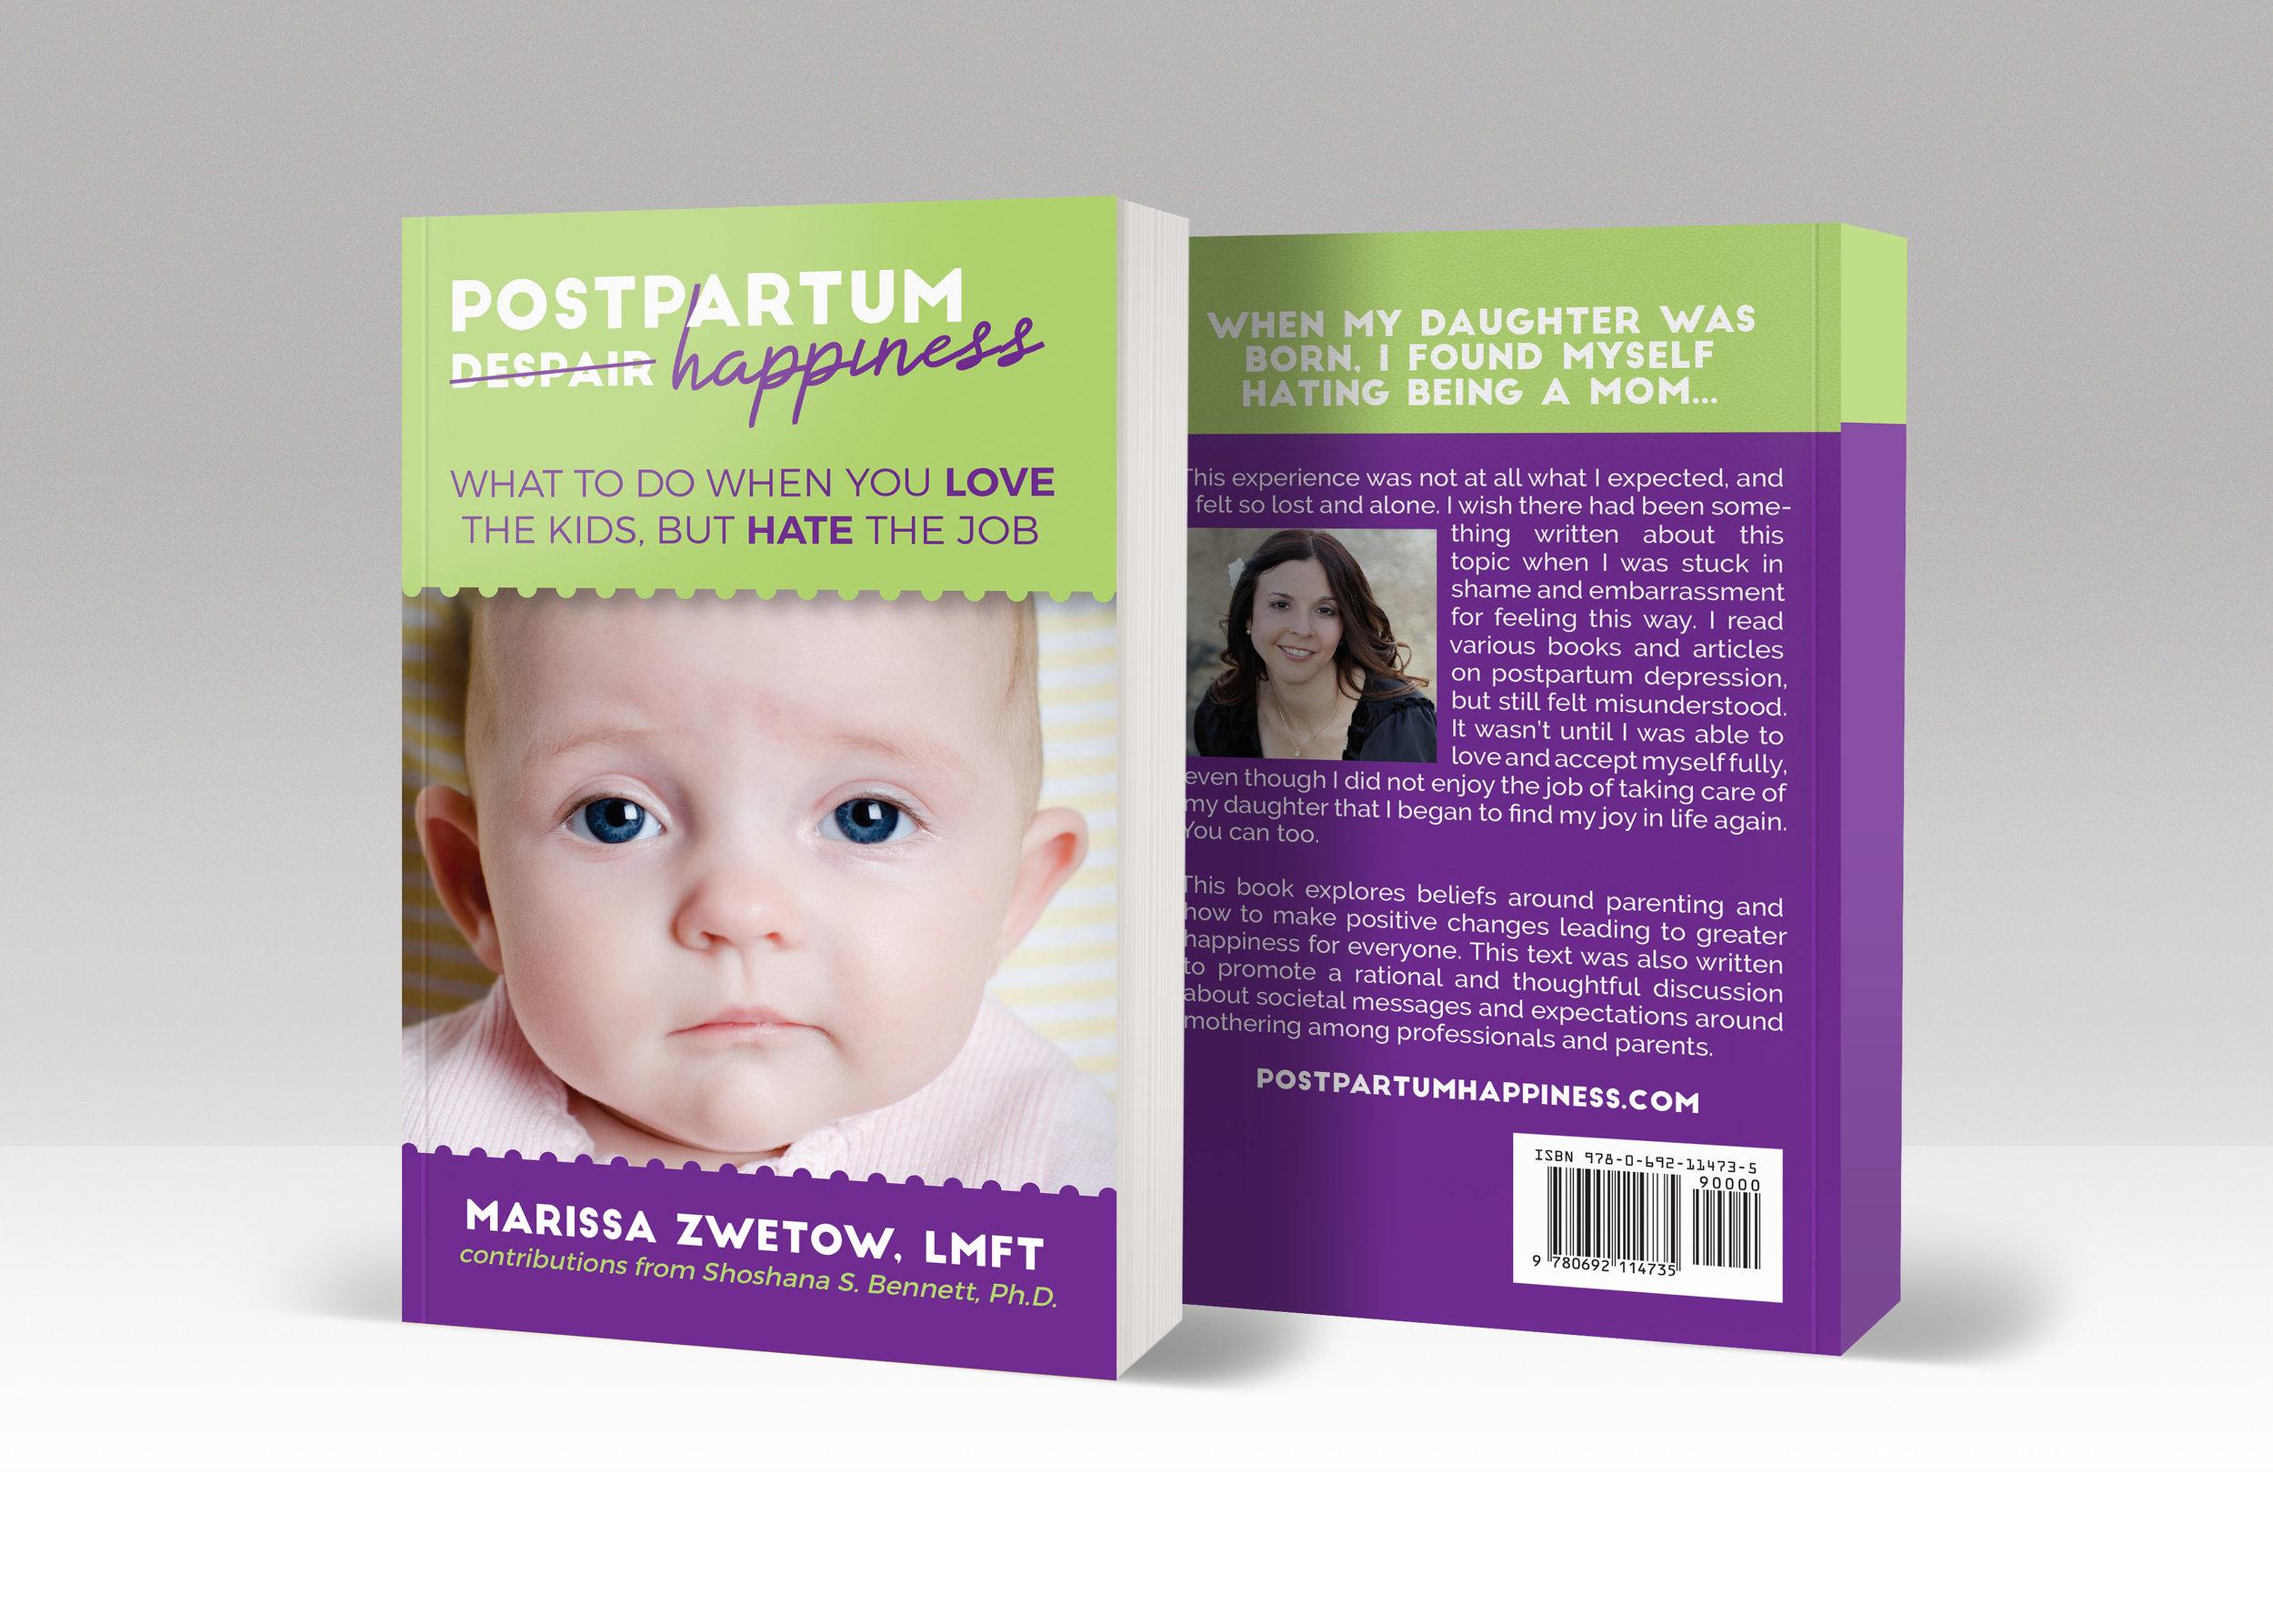 postpartum_book.jpg